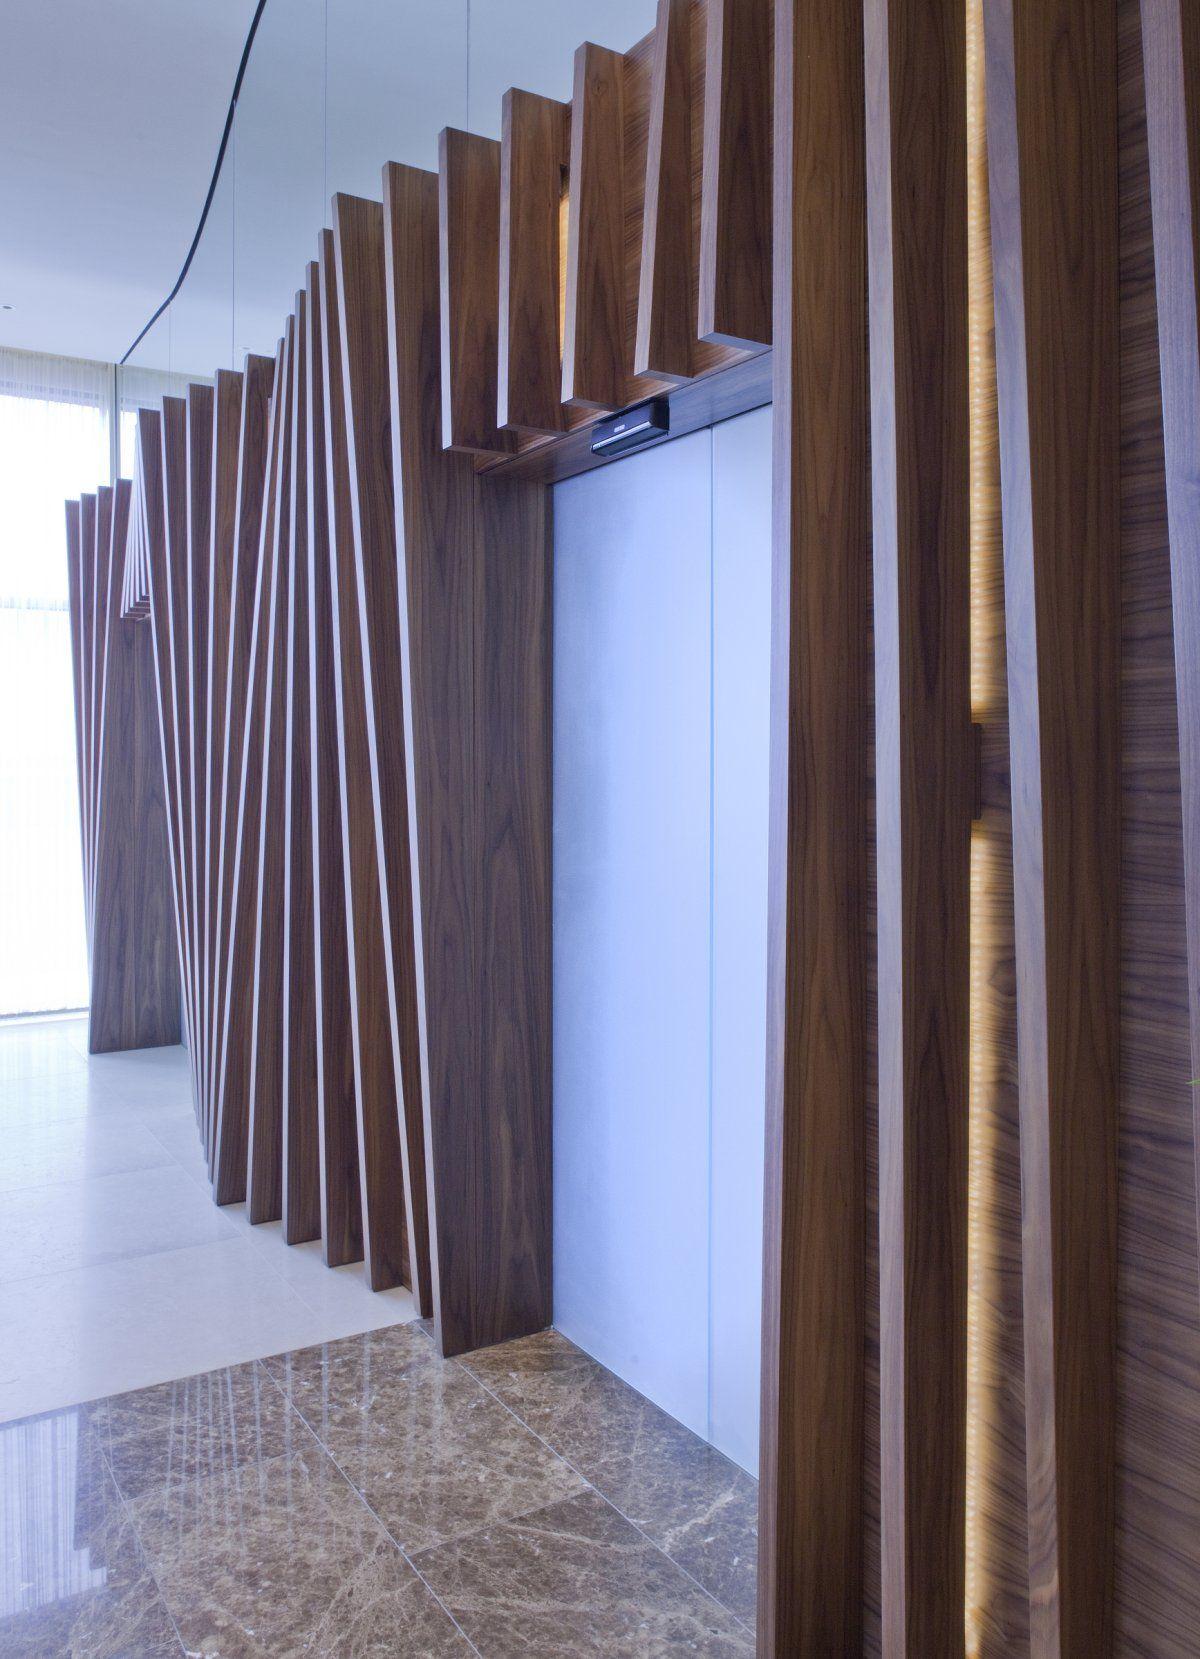 Elevator lobby id cool facades pinterest elevator for Wood slat wall design